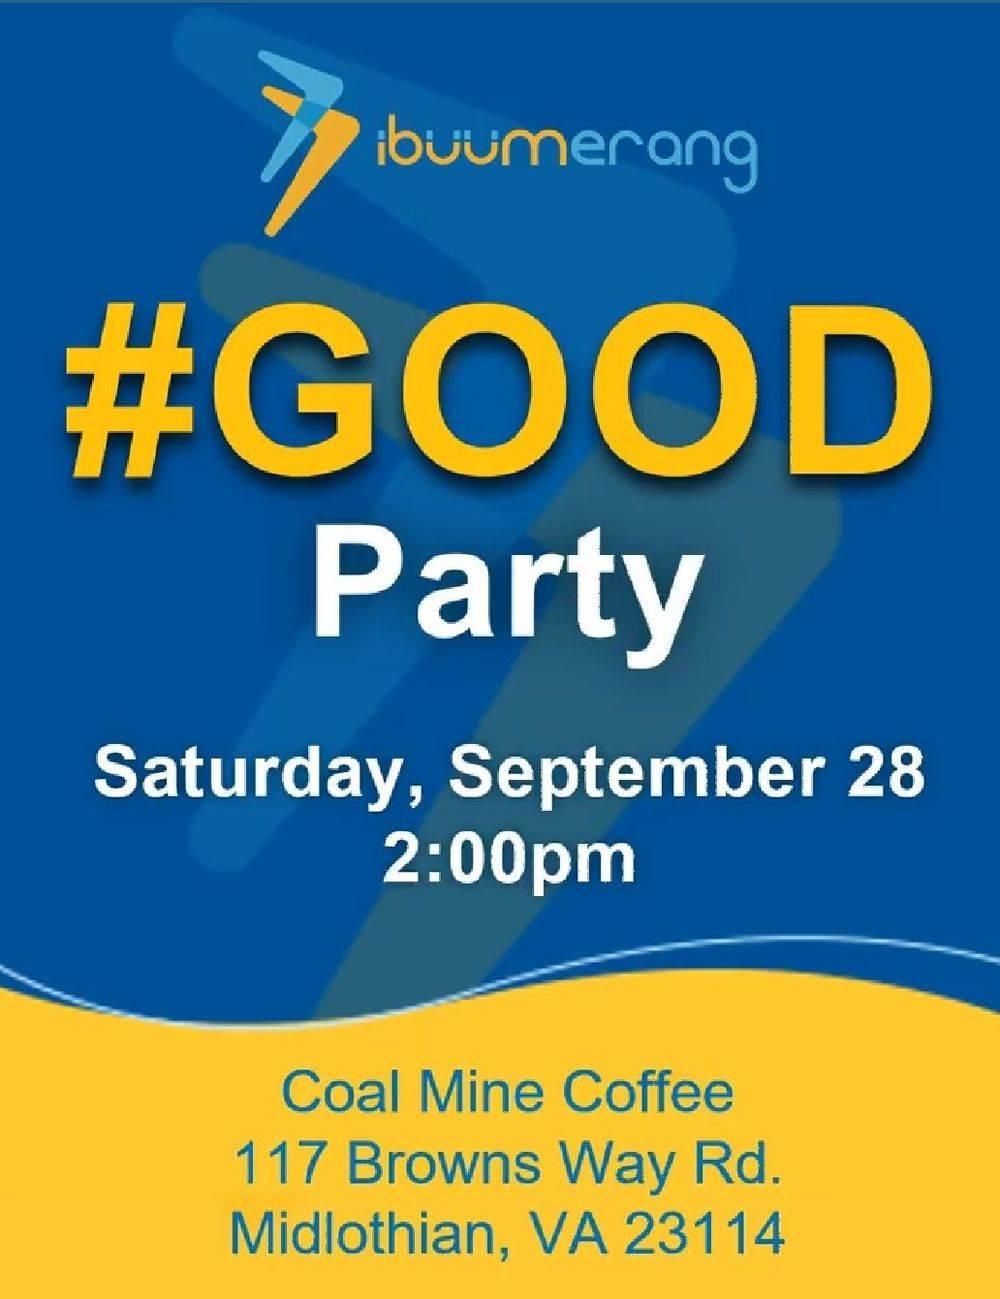 iBuumerang #Good Party Midlothian, VA hosted by Lady Scott Enterprises